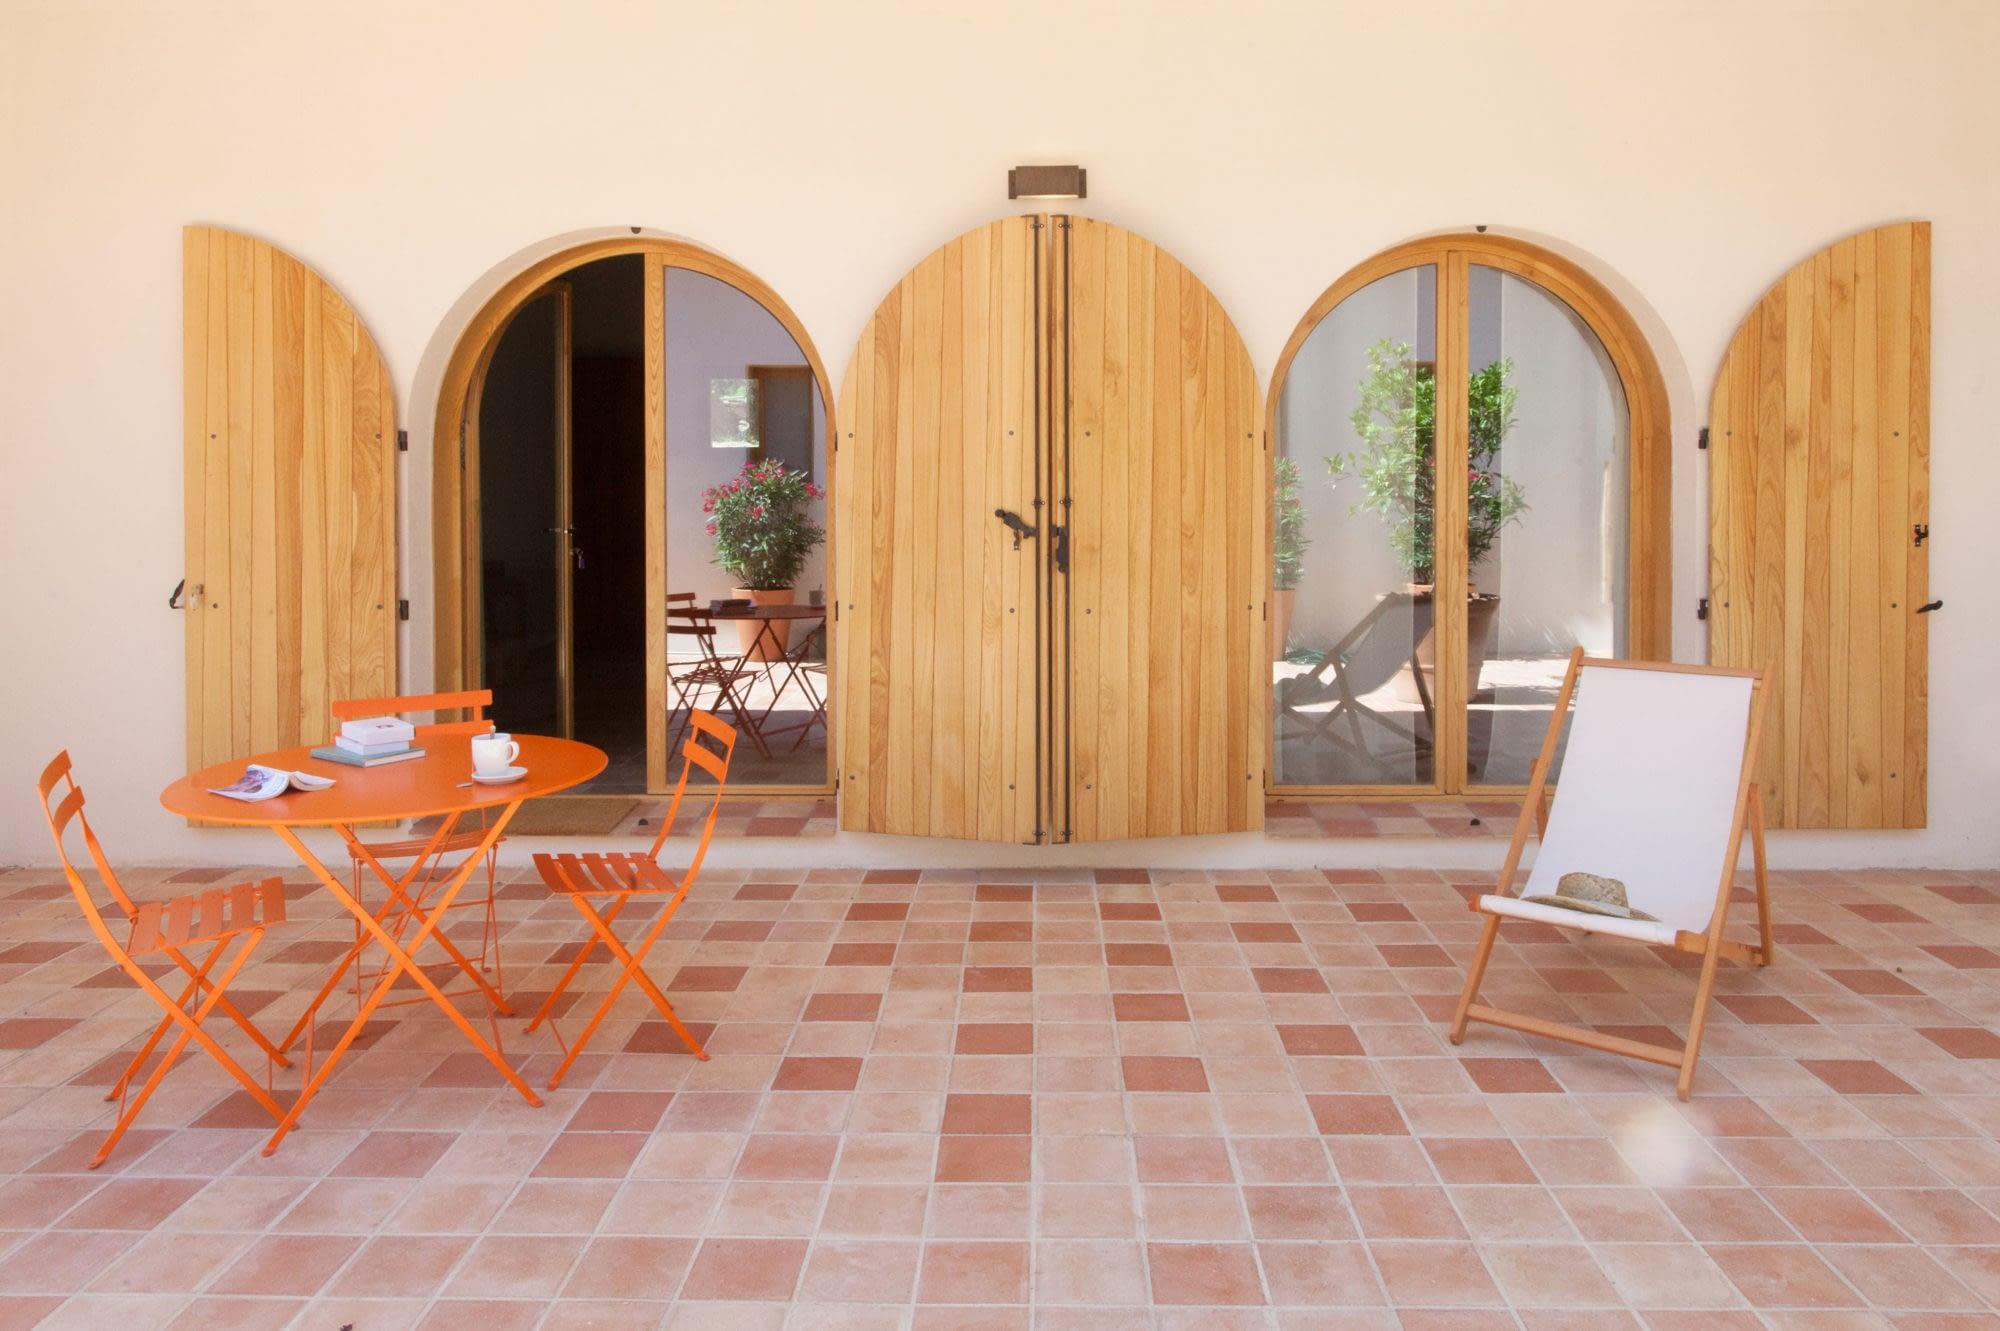 Terrasse dans L'oranger / Terrace in the house L'oranger